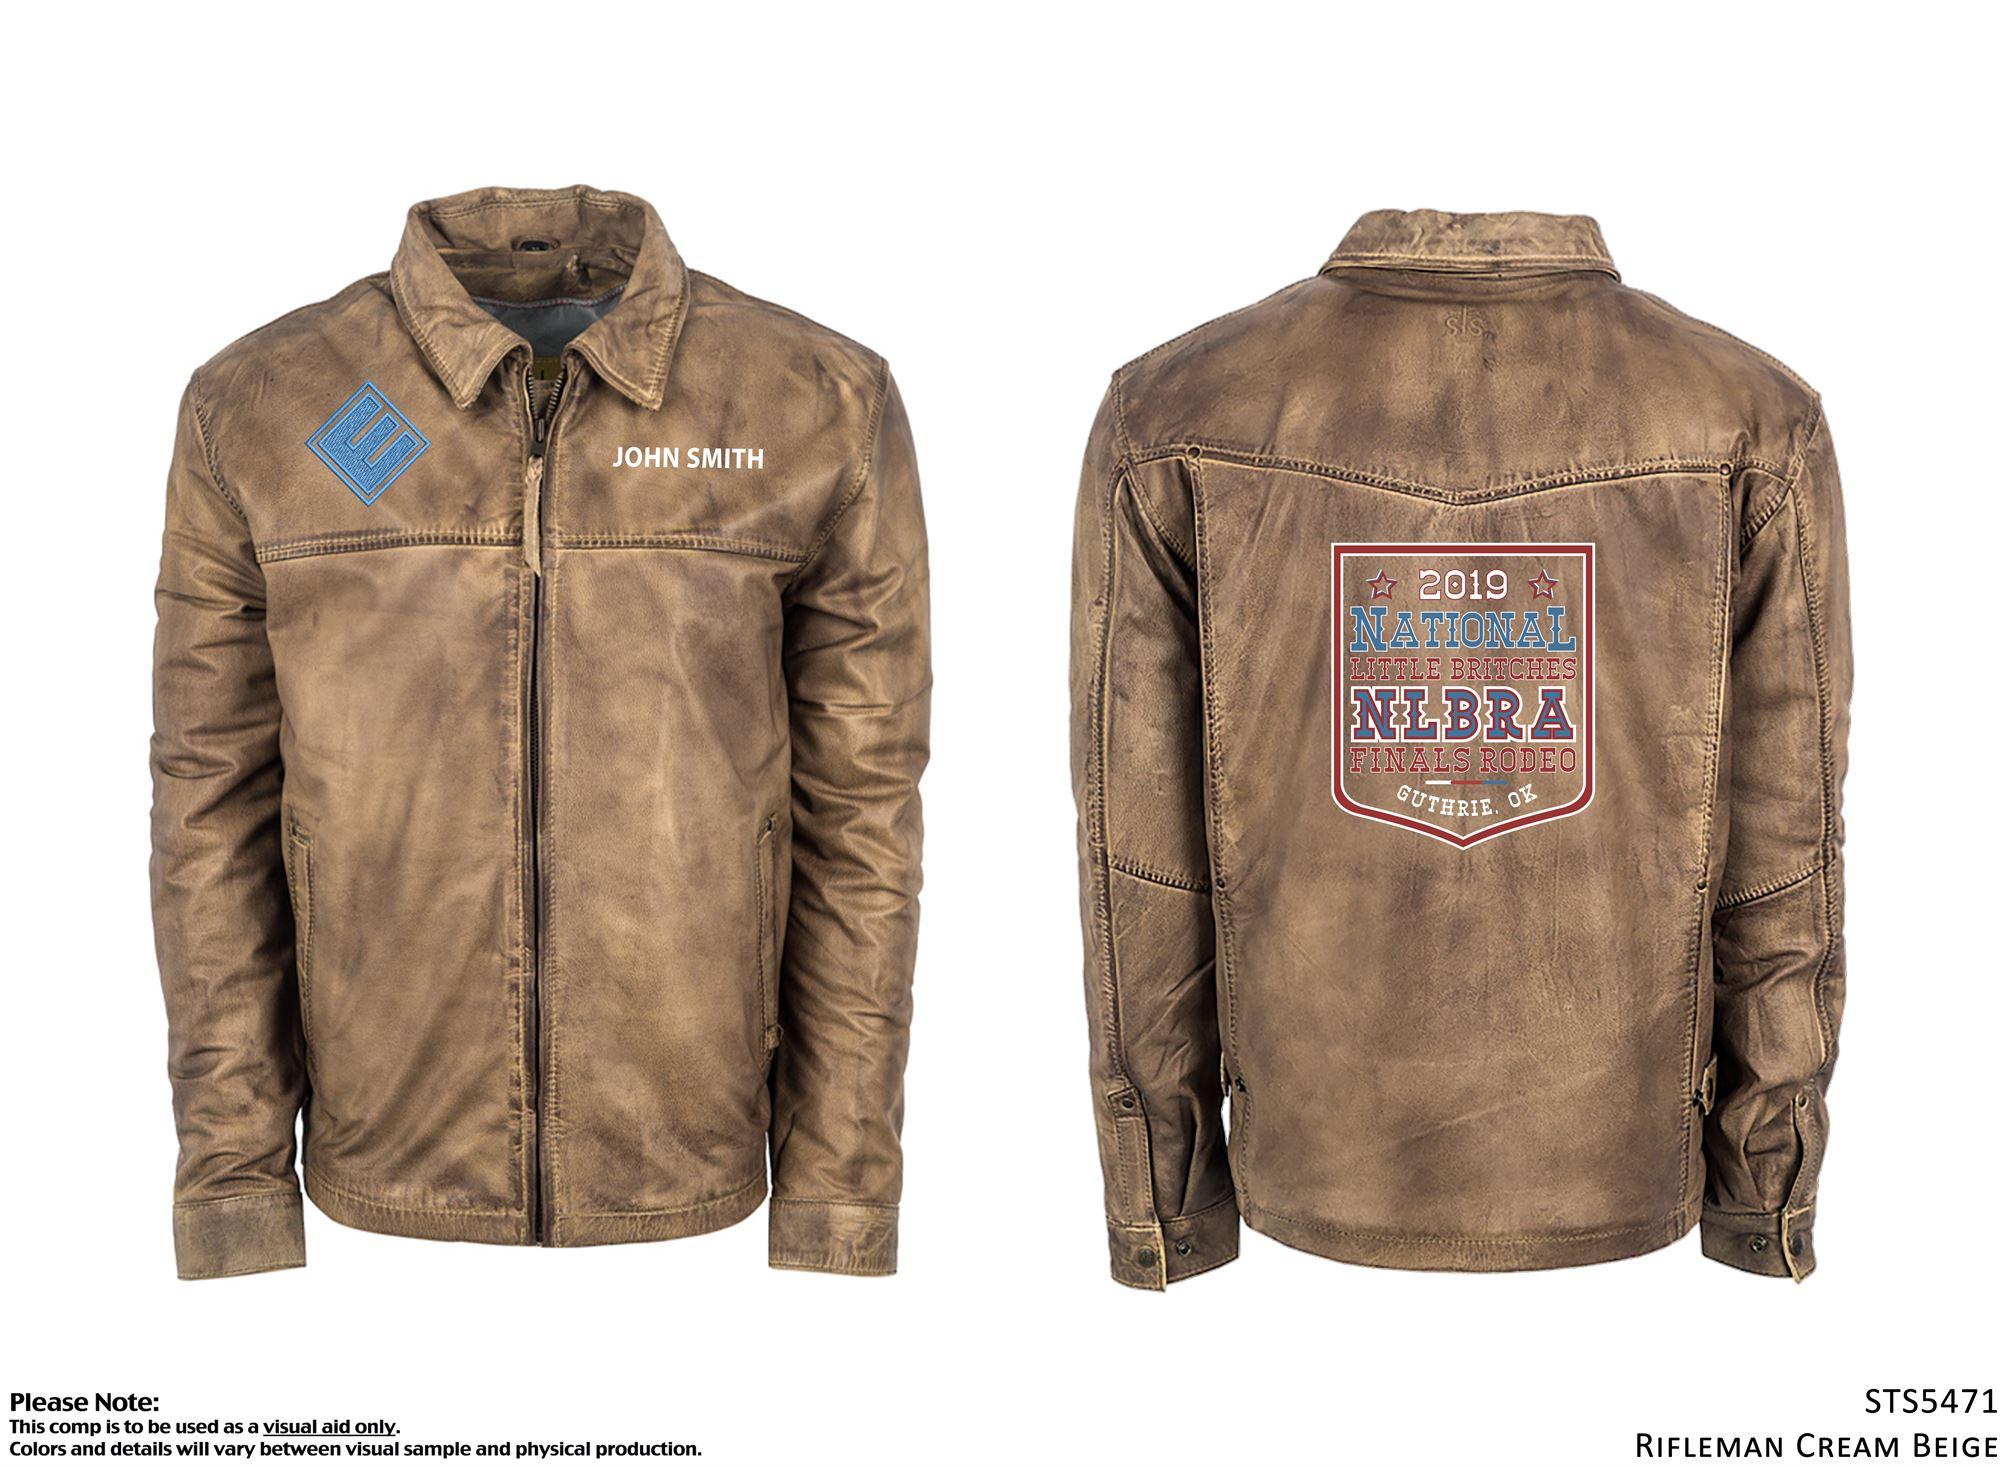 #NLBFR2K19 Jacket